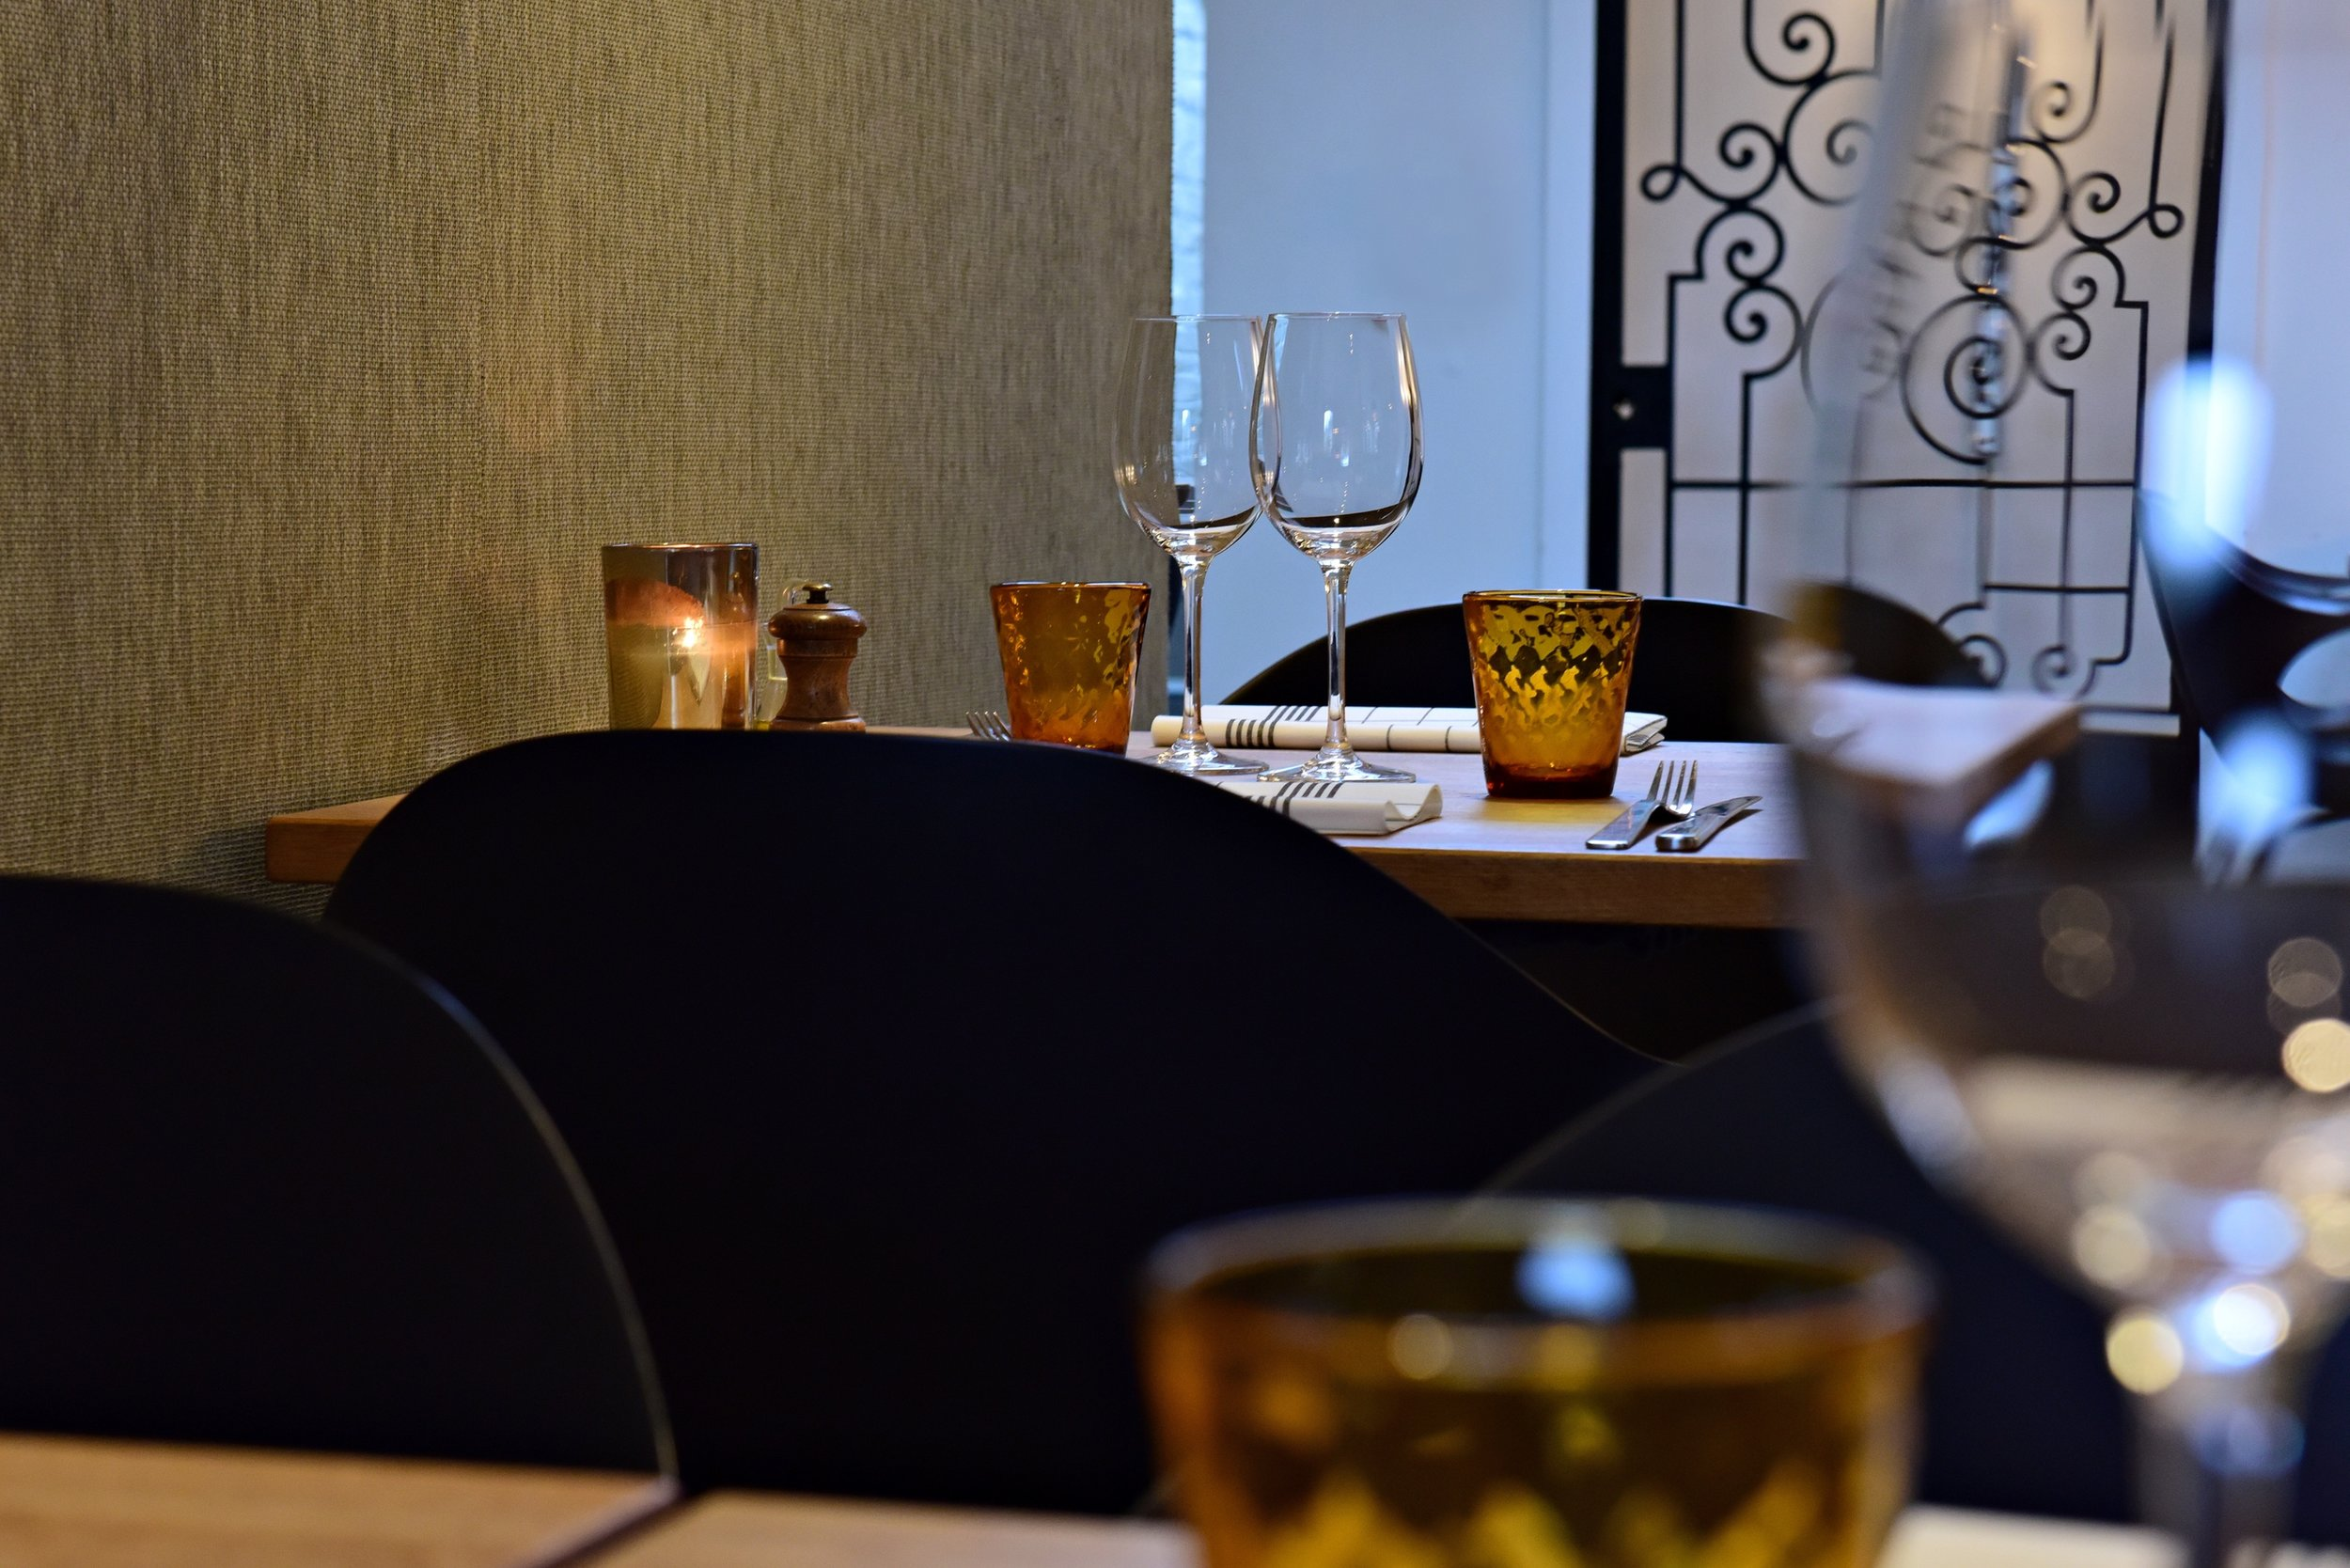 5 brasserie juste restaurant Dikkelvenne tablefever bart albrecht culinair fotograaf foodfotograaf.jpg